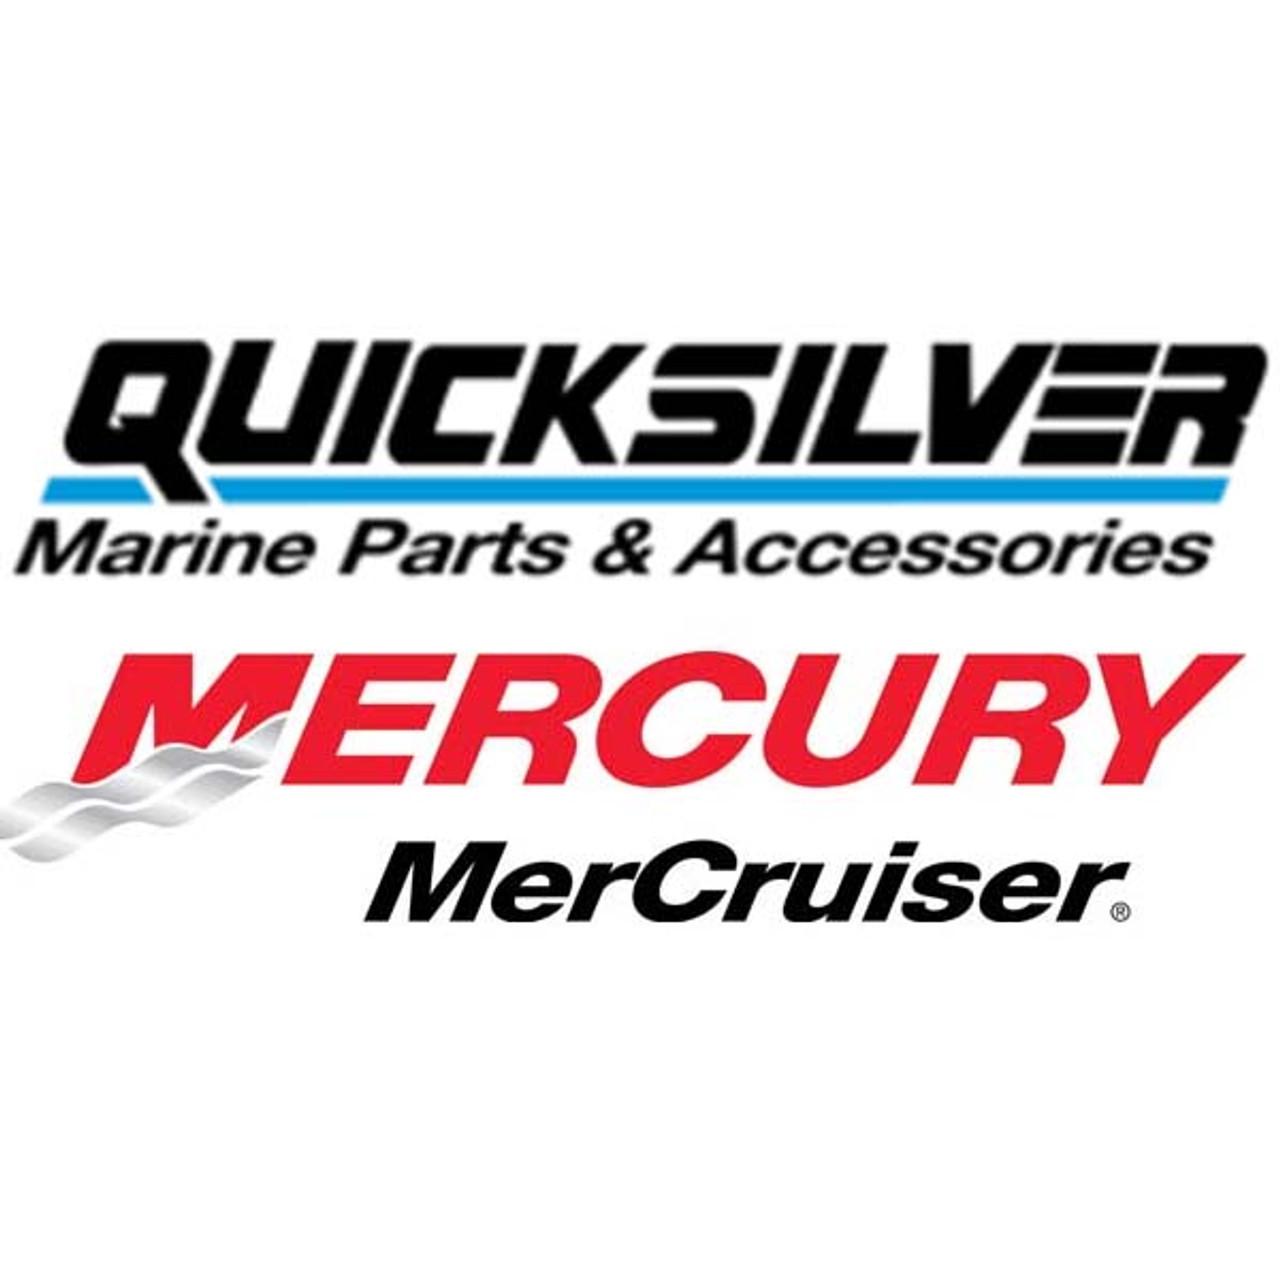 New Mercury Mercruiser Quicksilver Oem Part # 27-75611001 Gasket